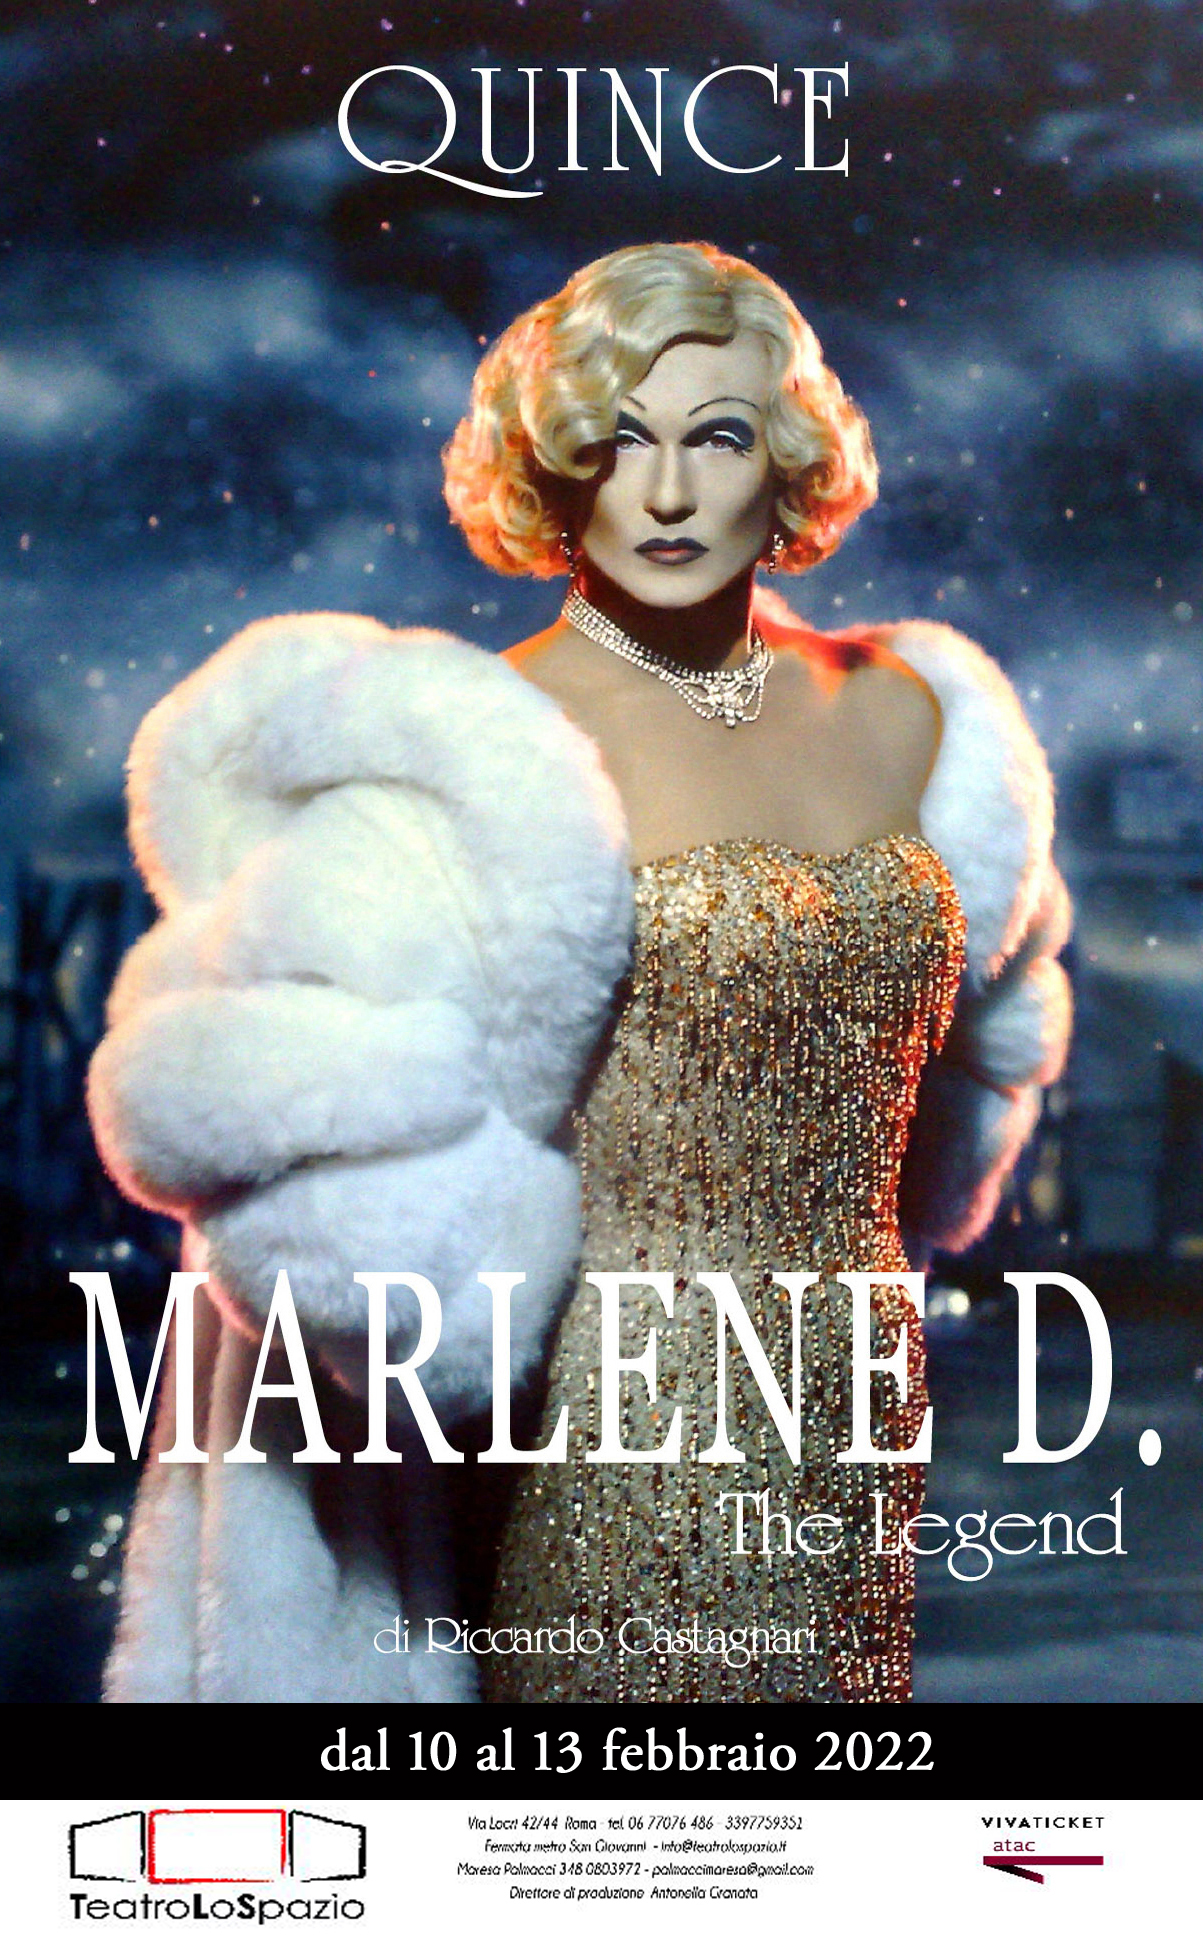 MARLENE D. The Legend